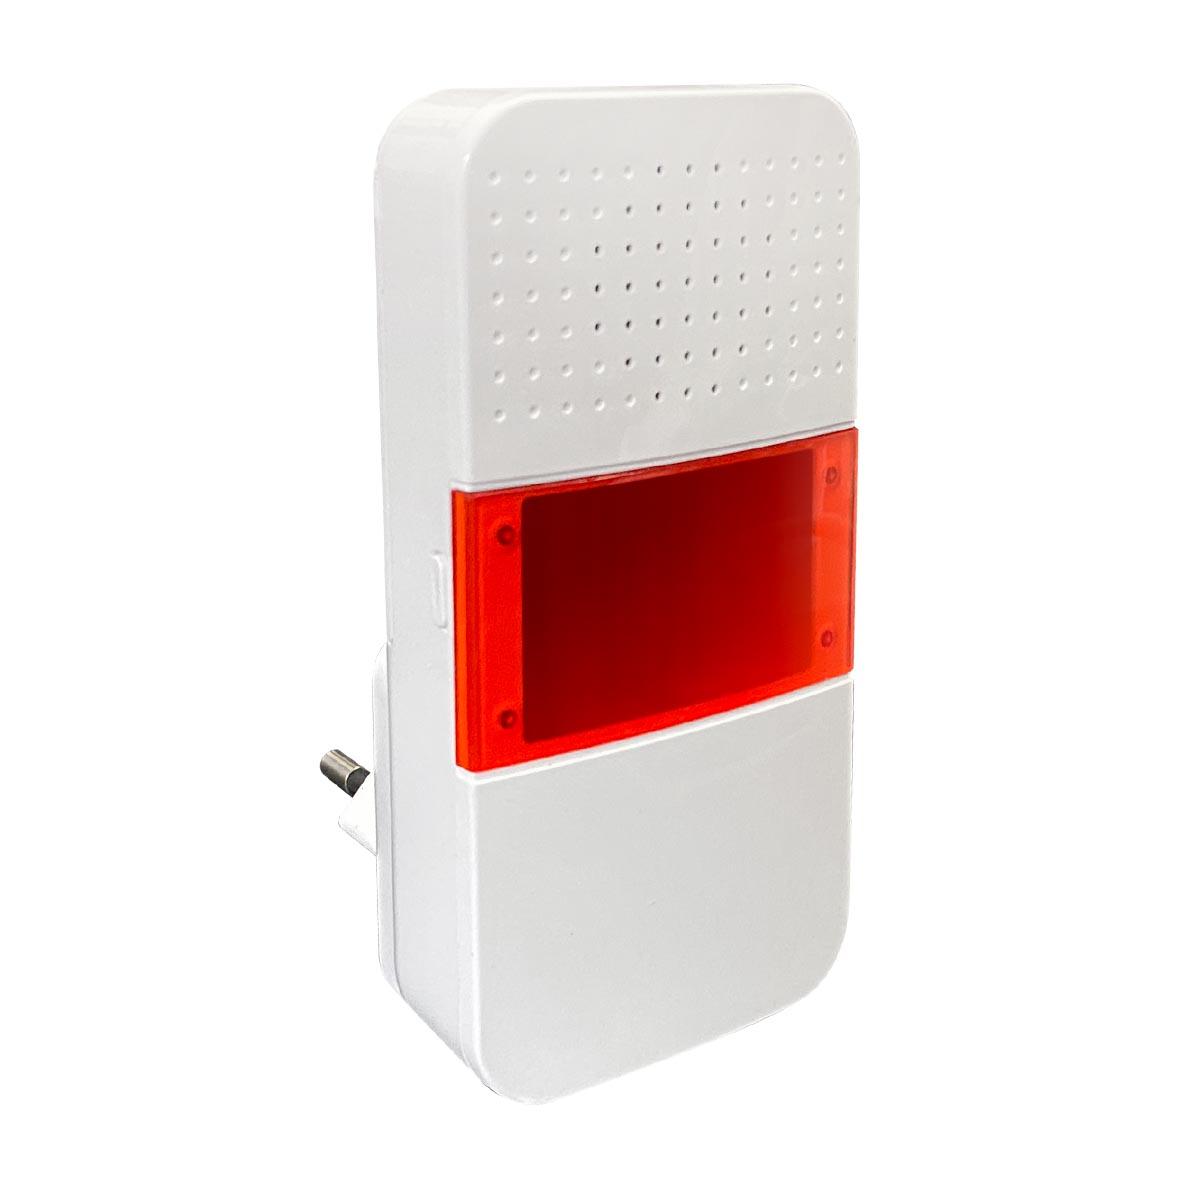 Blitzlicht-Sirene zum T1 Alarmsystem